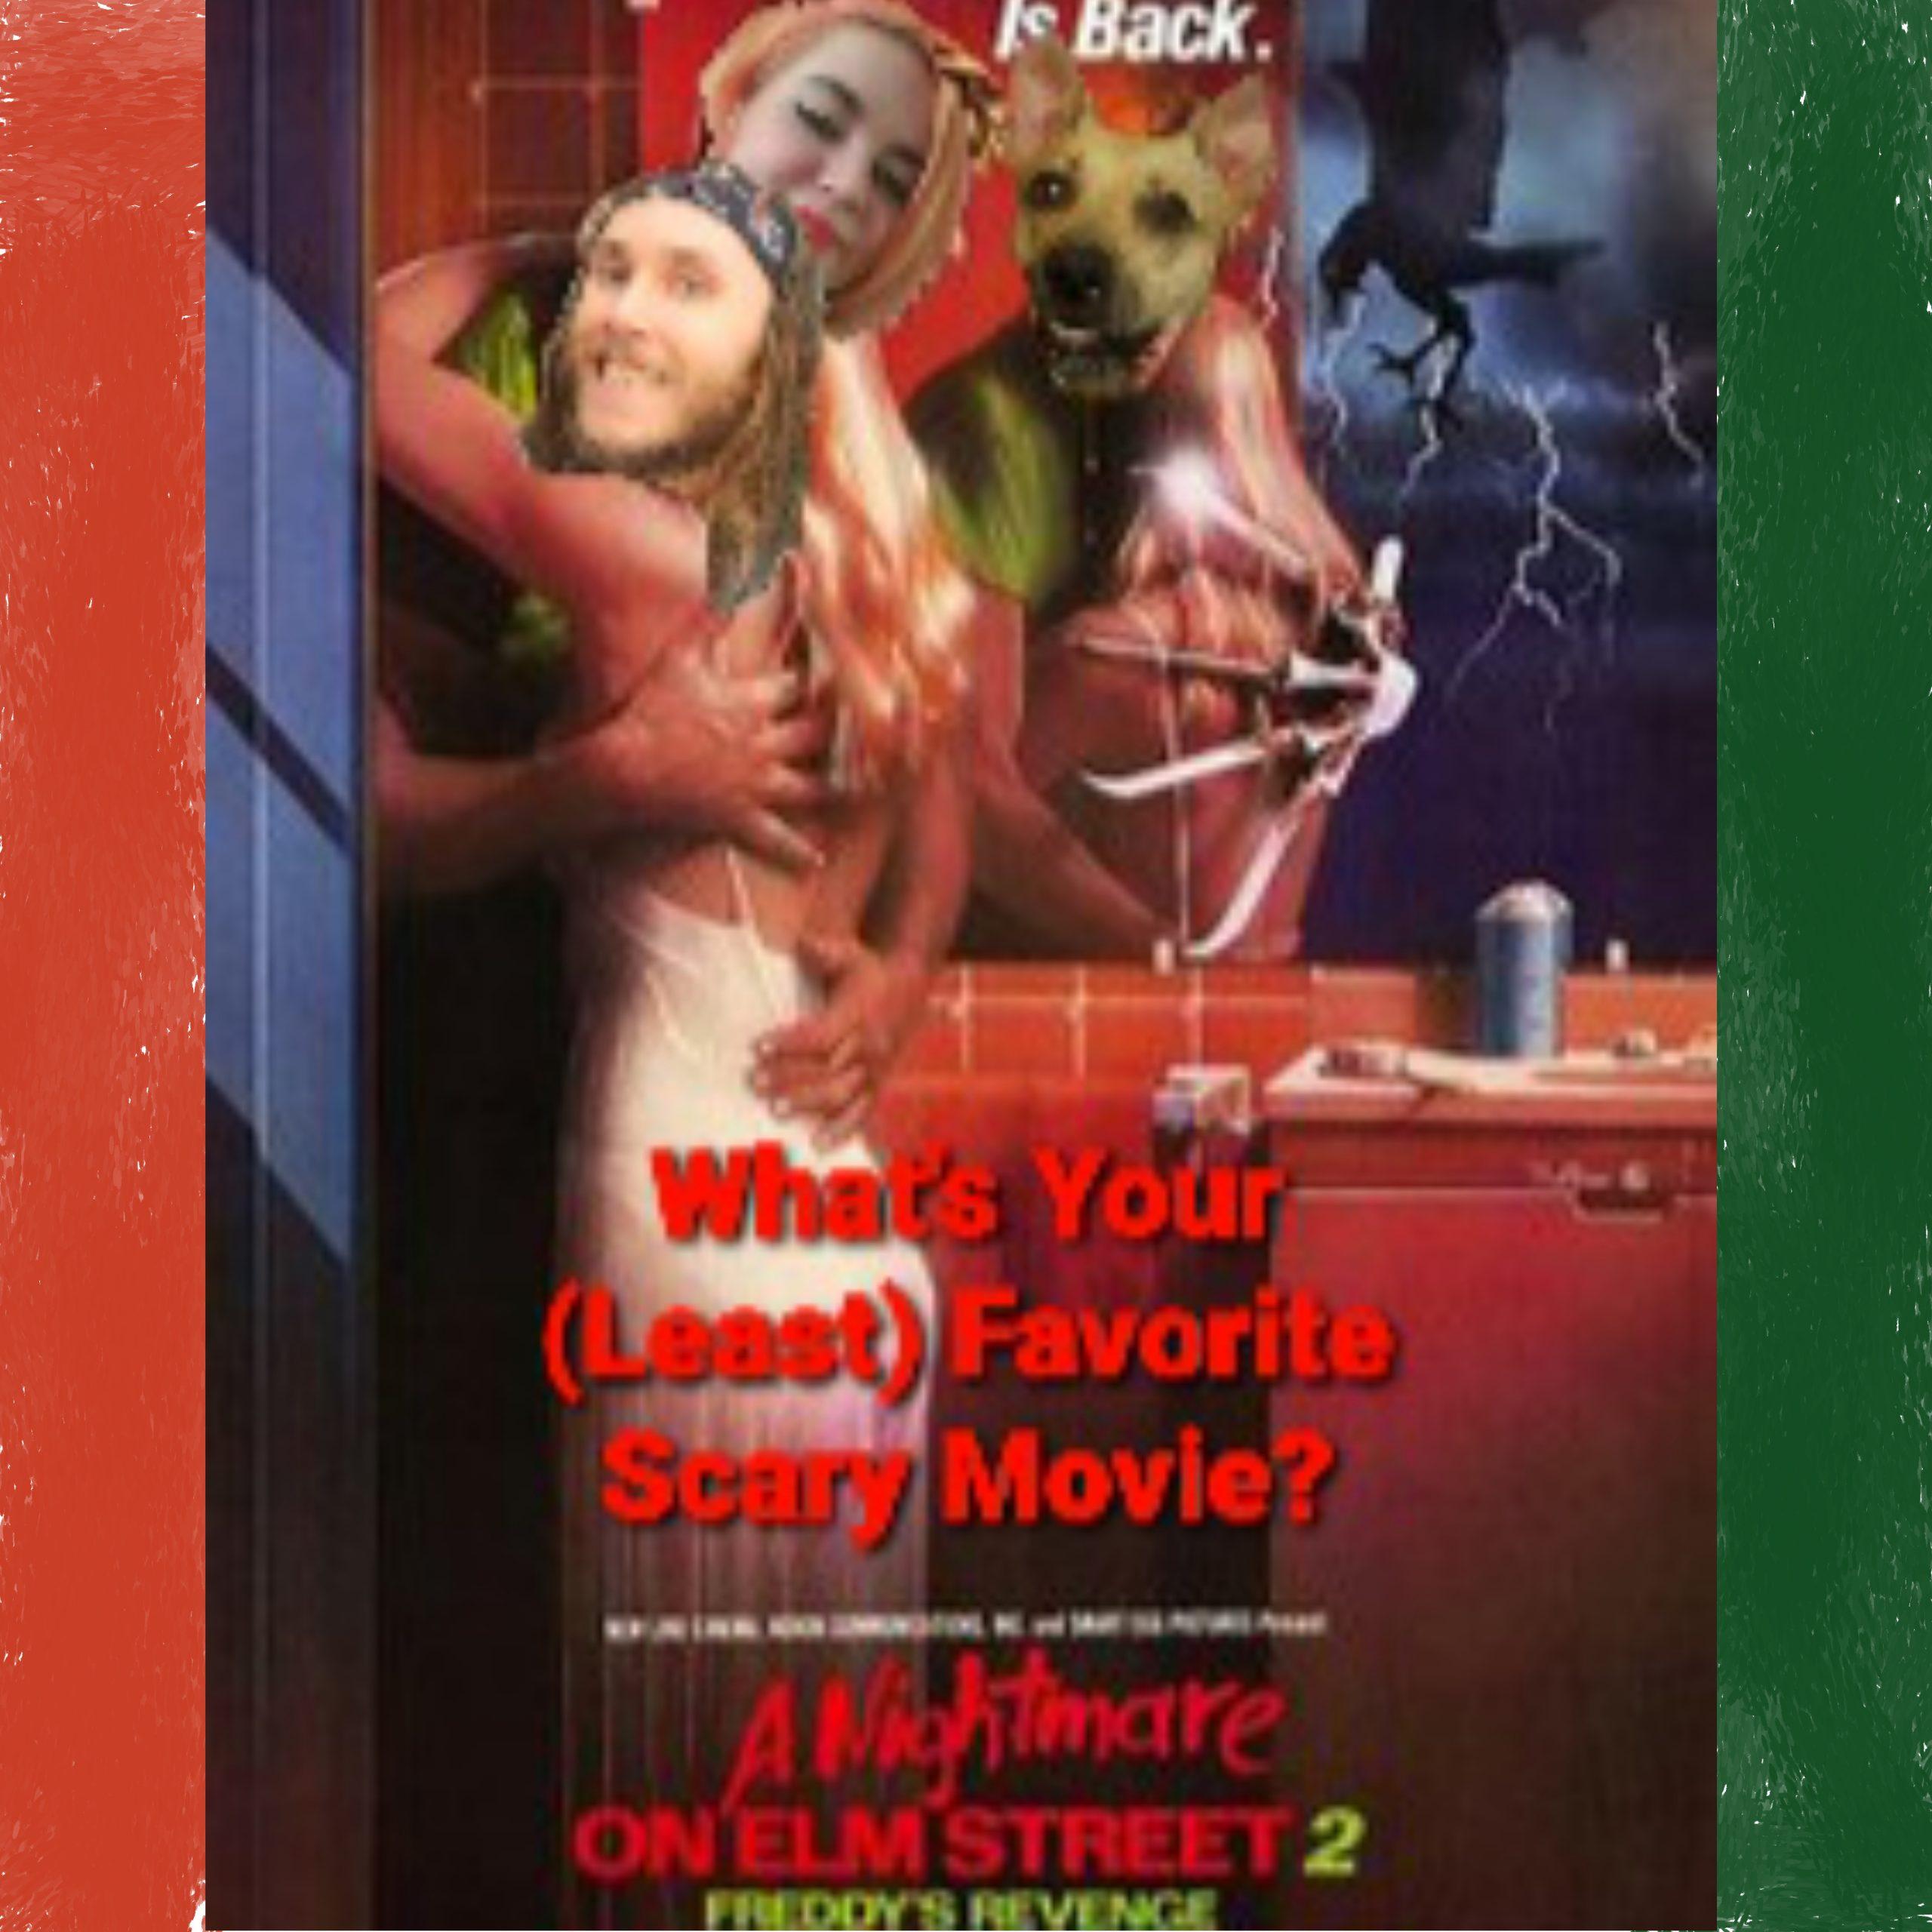 #34: A Nightmare on Elm Street 2: Freddy's Revenge (1984) [Bonus]